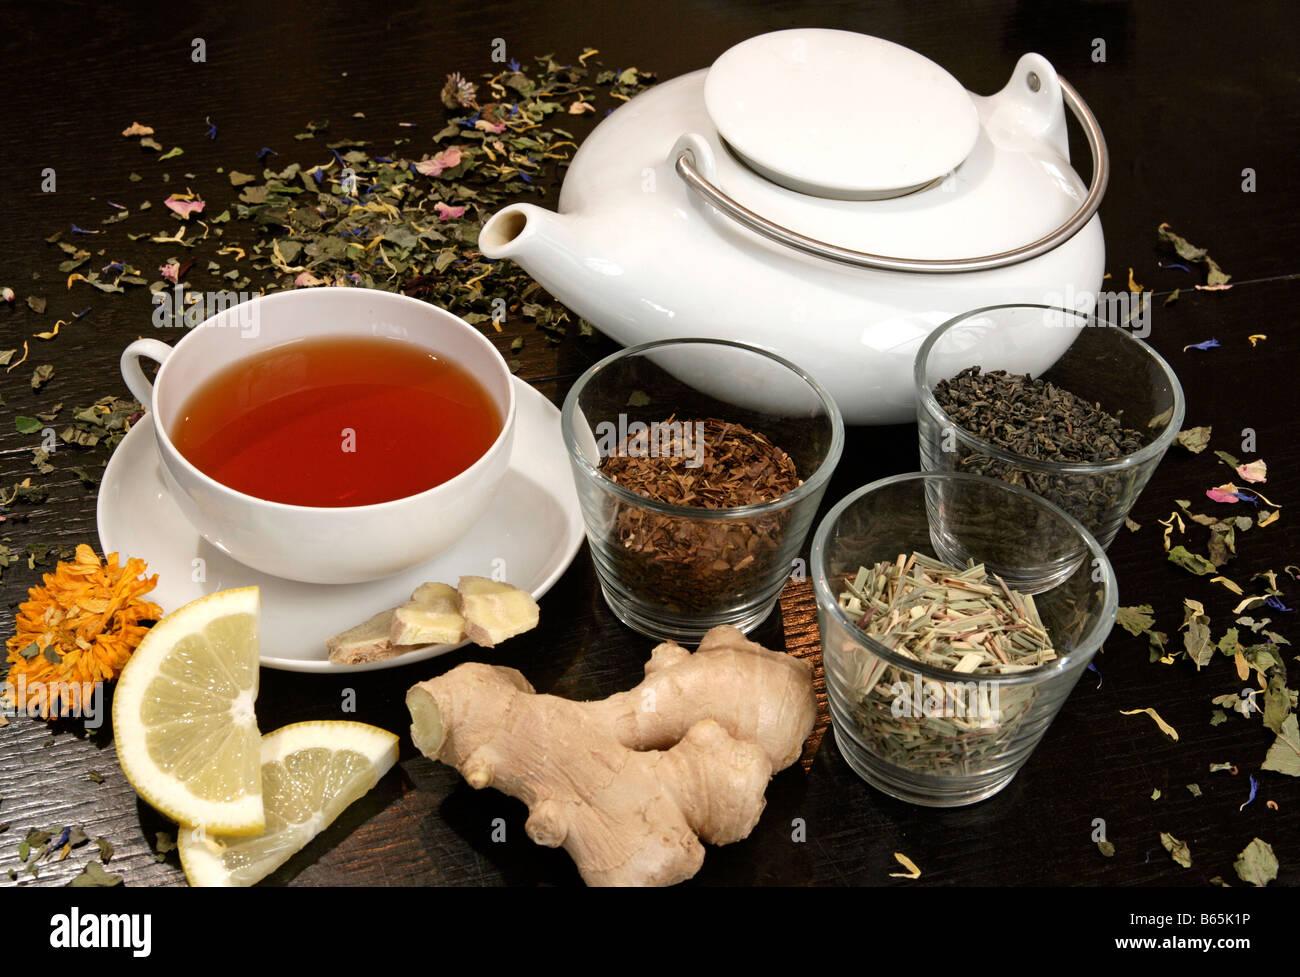 Tea still life with rooibos tea & teacup, teapot, lemon and ginger - Stock Image